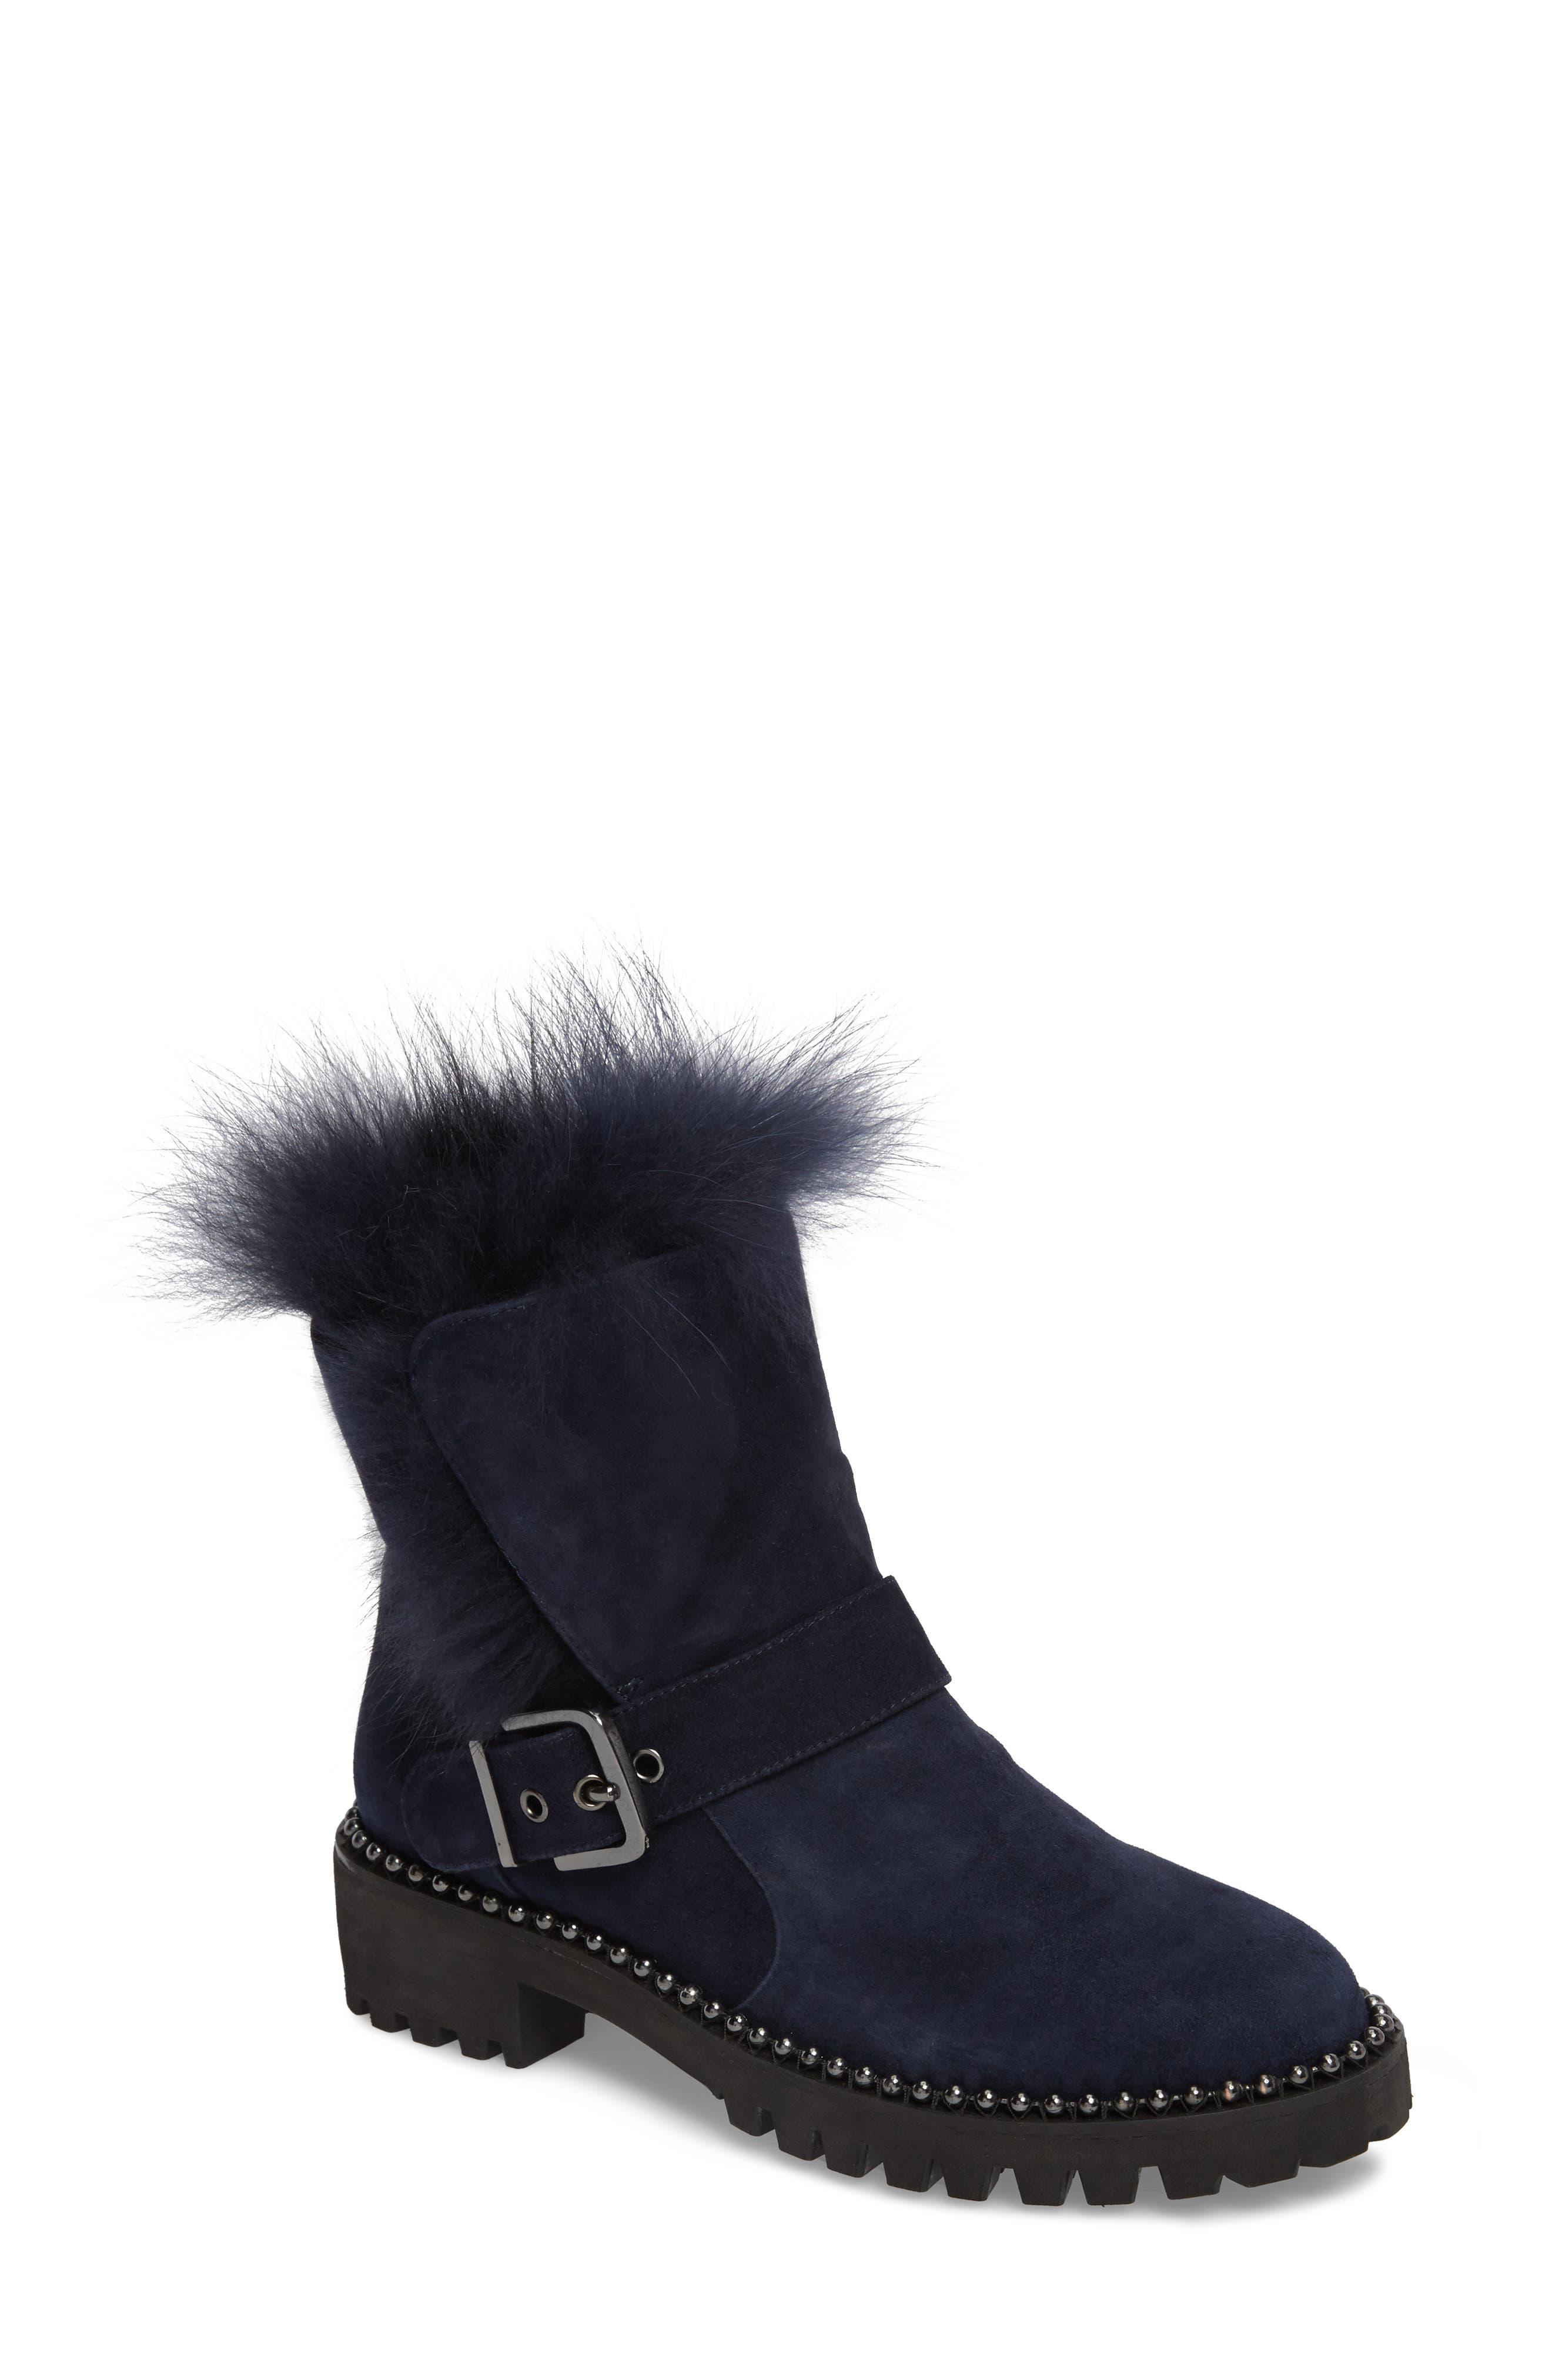 Alternate Image 1 Selected - Cecelia New York Theresa Boot with Genuine Fox Fur Trim (Women)